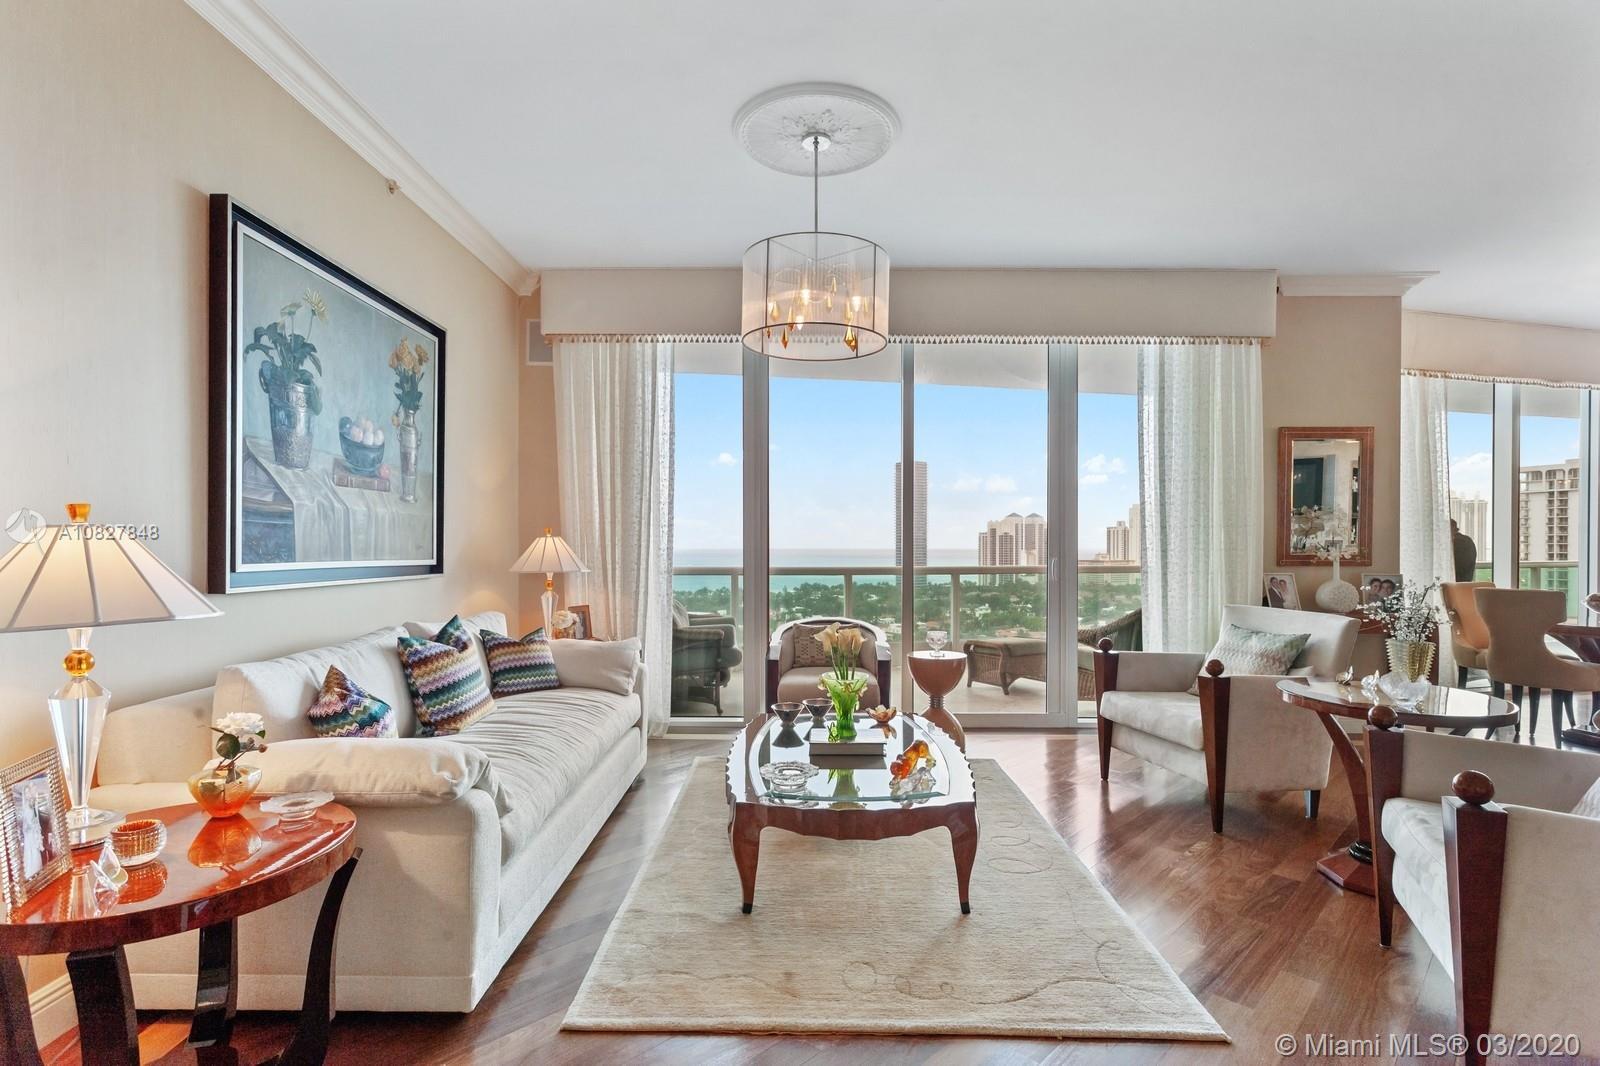 20155 NE 38th Ct #2101, Aventura, FL 33180 - Aventura, FL real estate listing